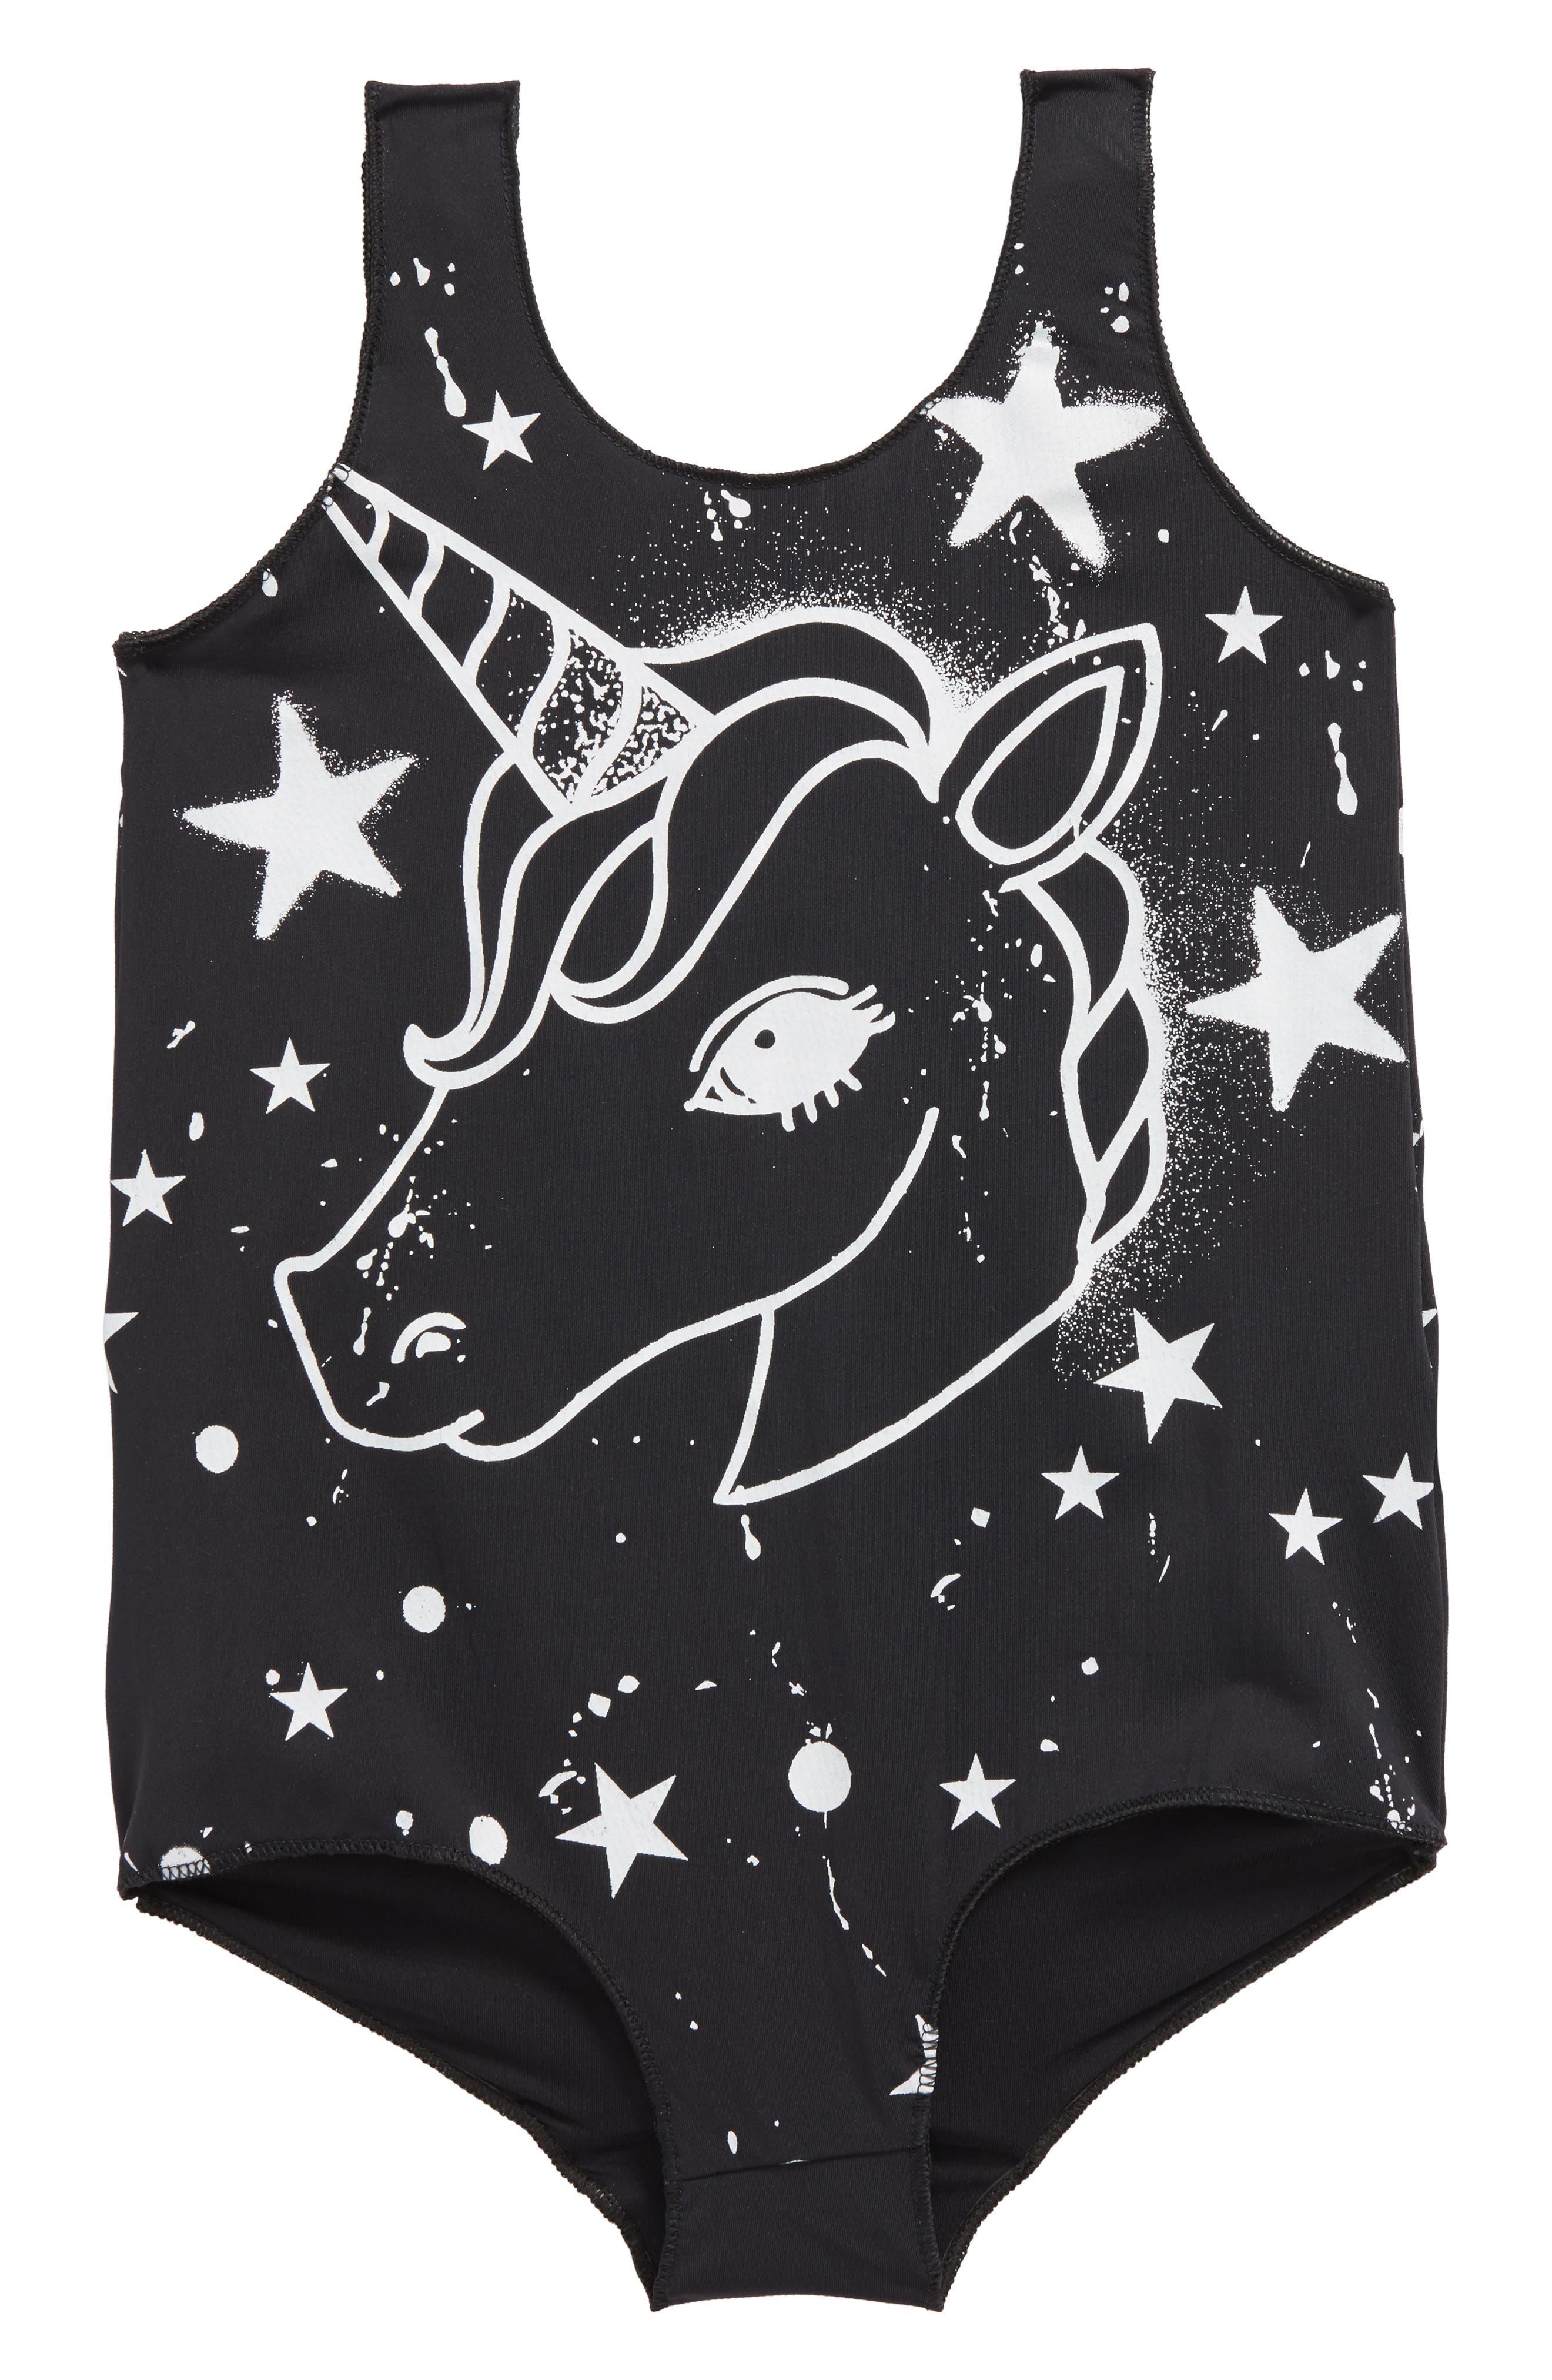 Unicorn One-Piece Swimsuit,                         Main,                         color, Black Unicorn